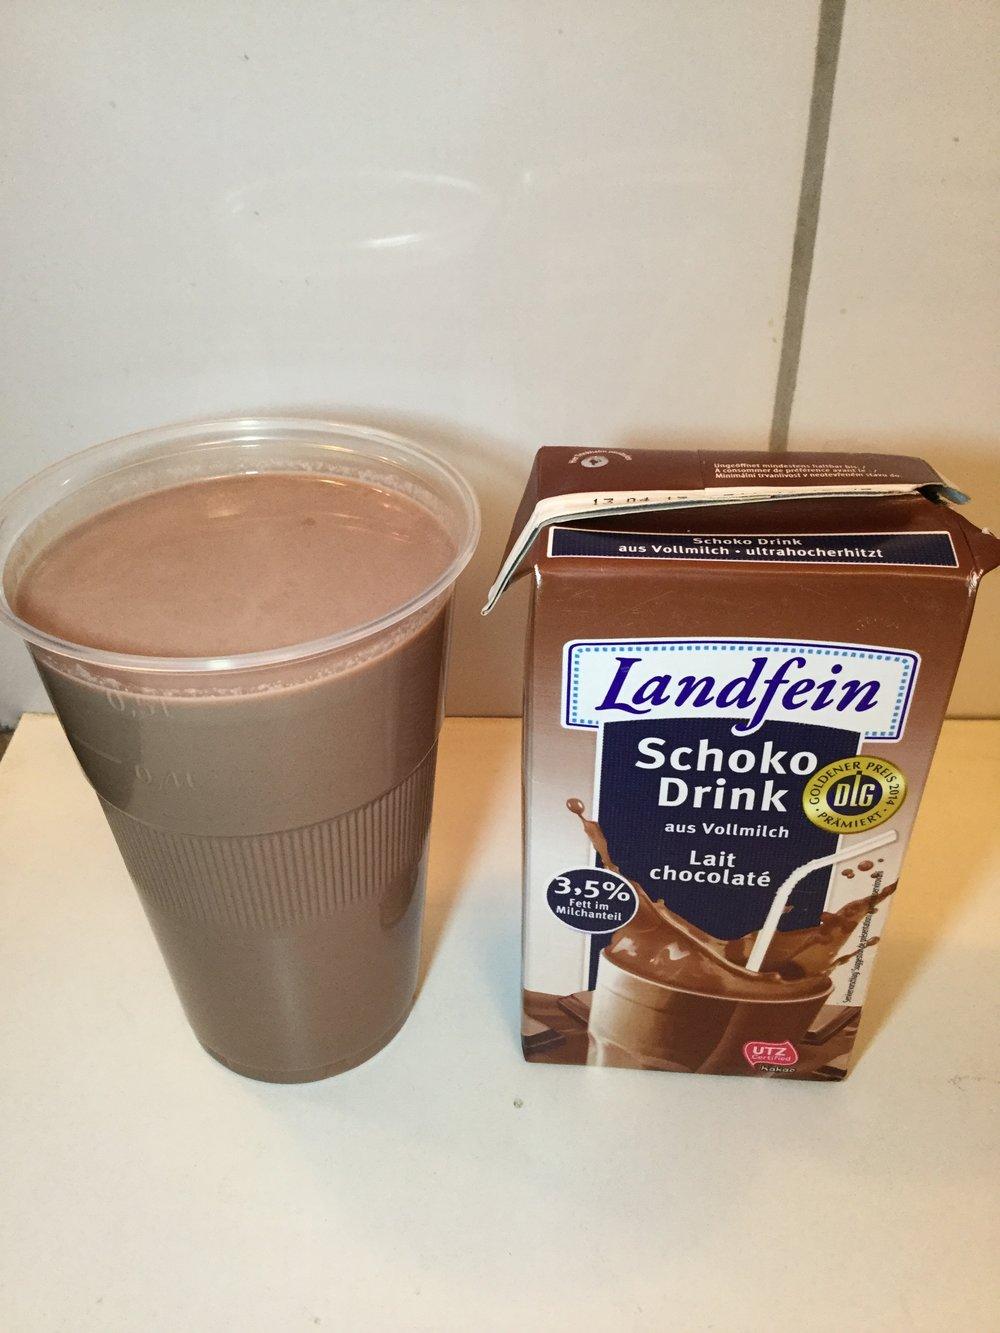 Landfein Schoko Drink (Whole) Cup